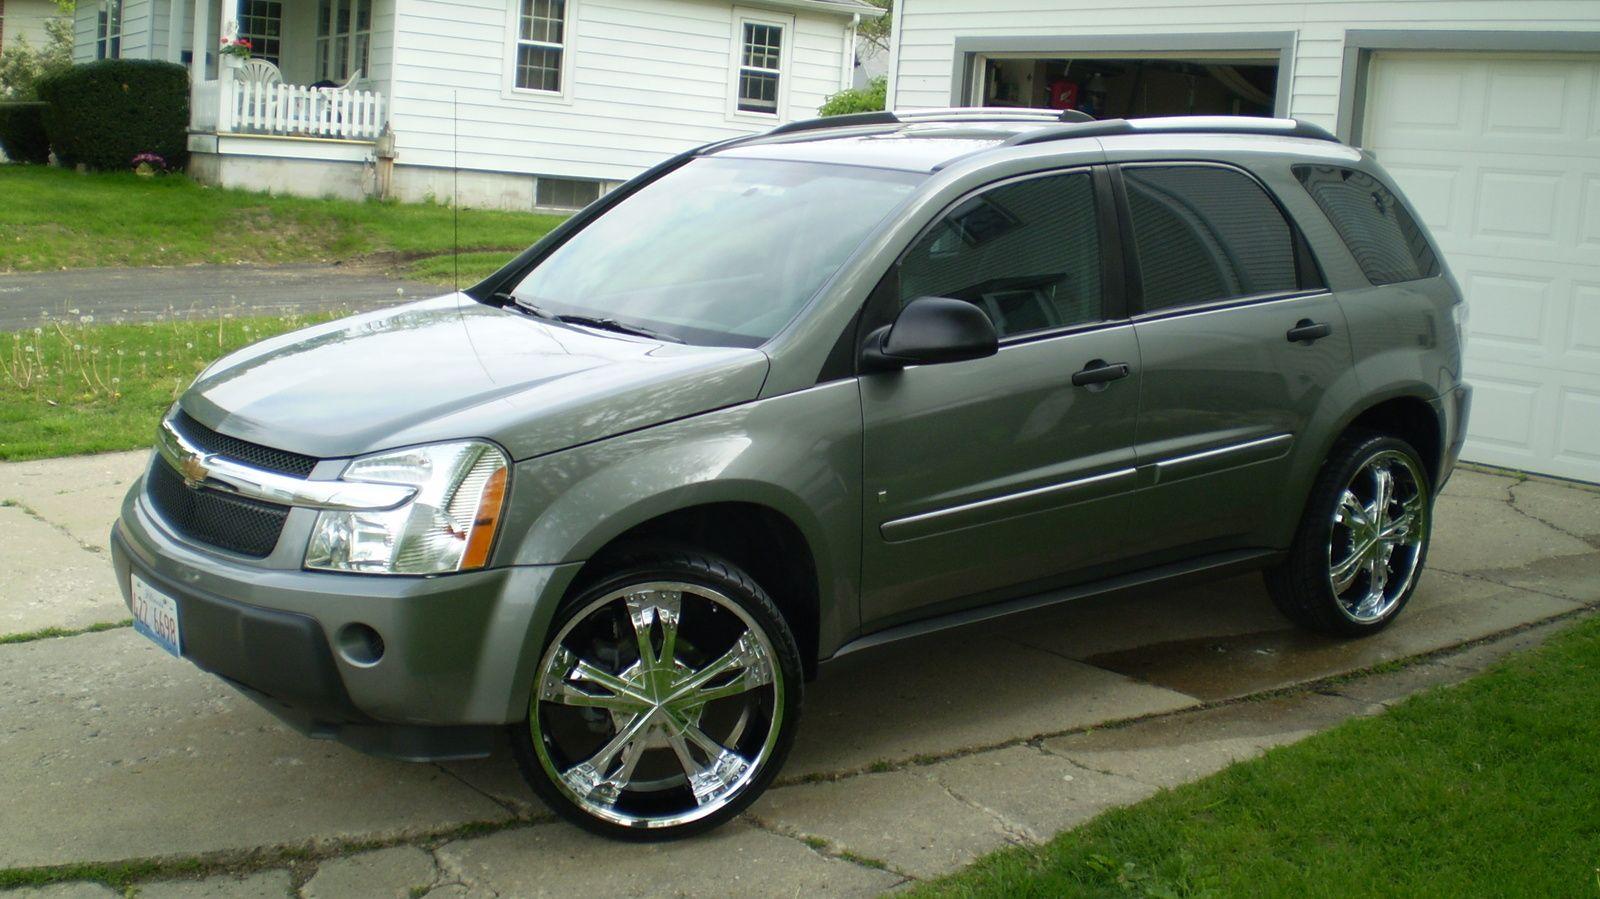 Equinox 2007 chevrolet equinox specs : Chevrolet Equinox 2006 Rims | Chevrolet Equinox LS AWD (2006) | I ...